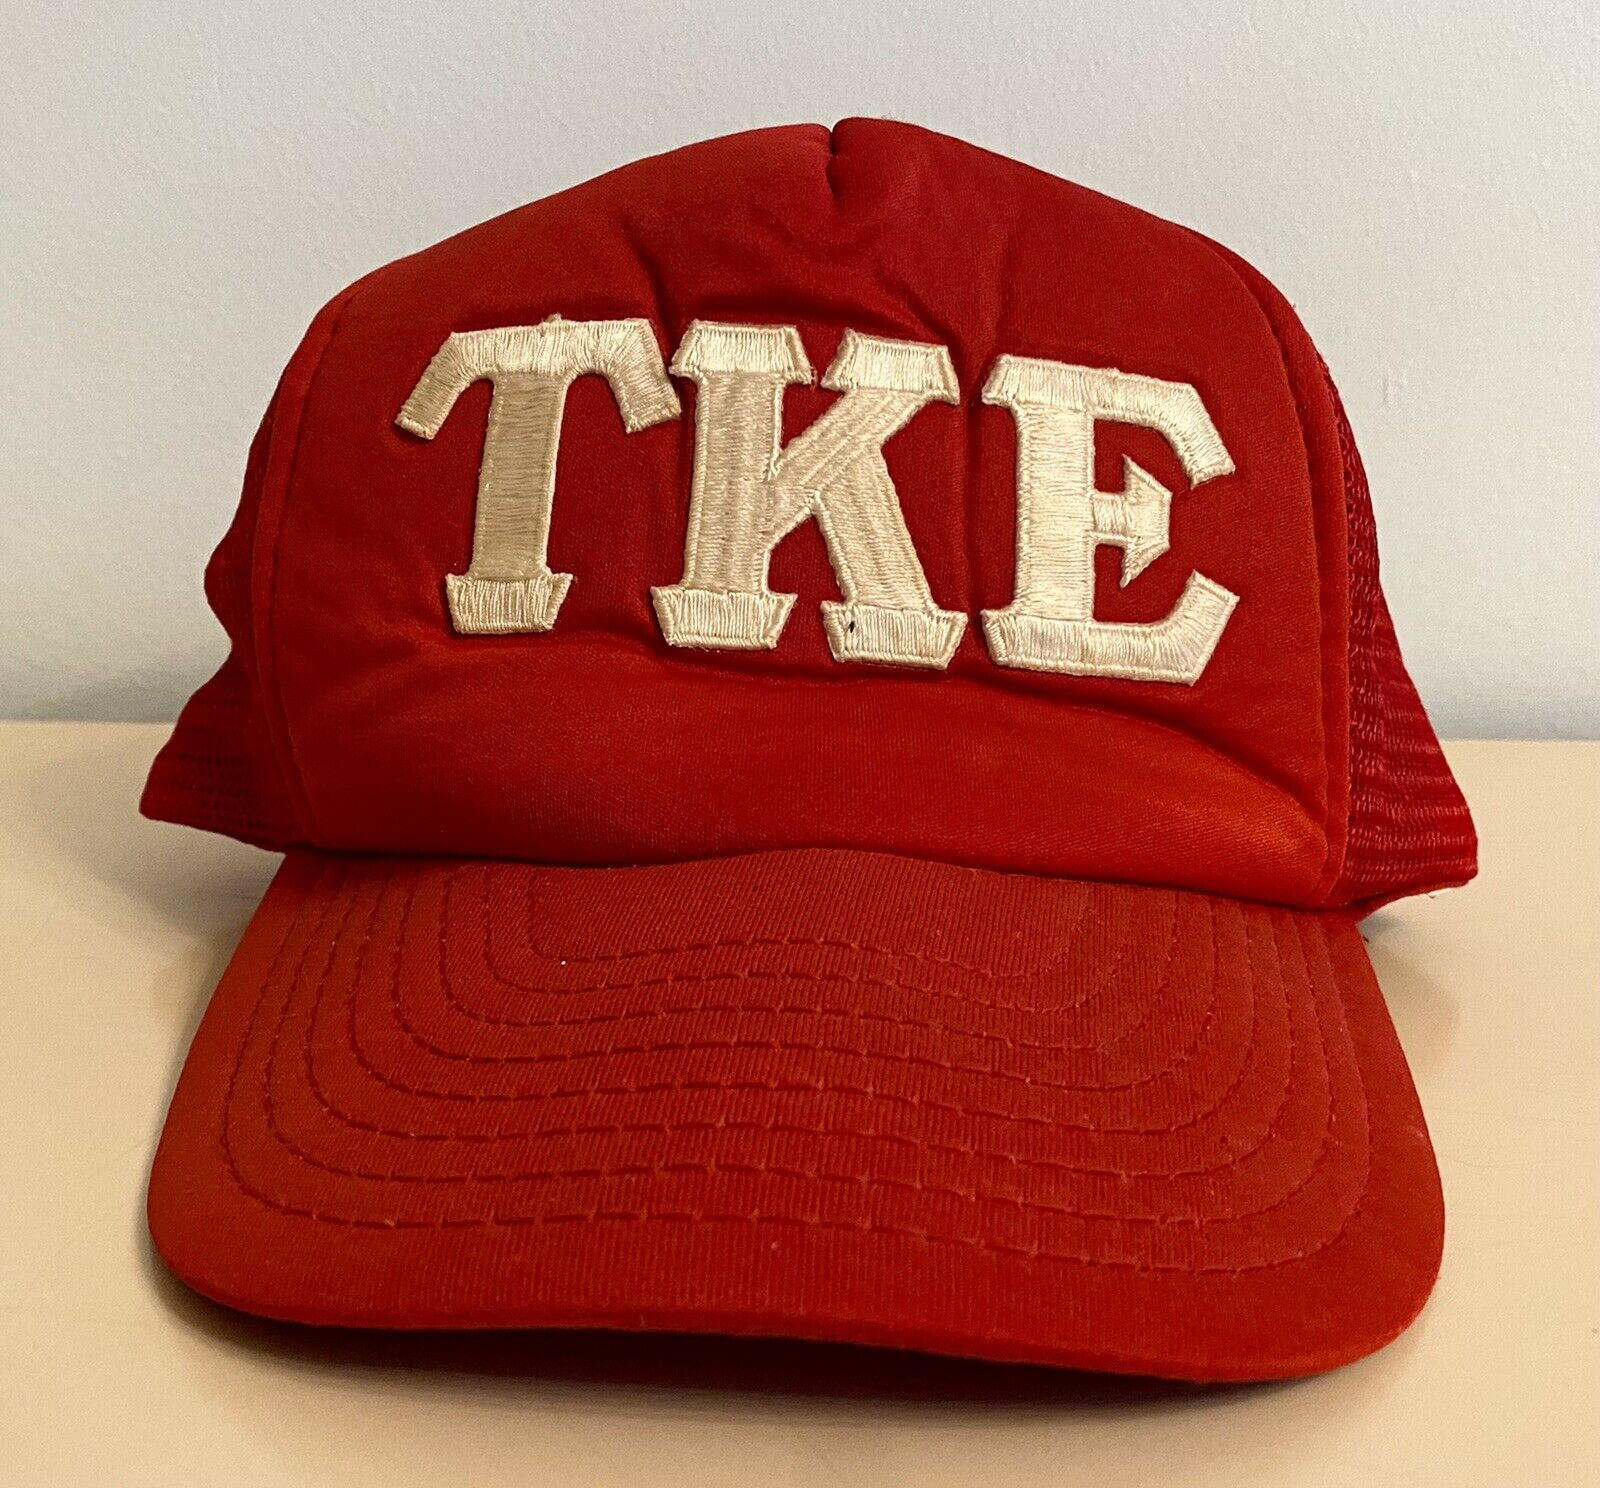 Vintage TKE Fraternity Snapback Trucker Hat Red - image 1